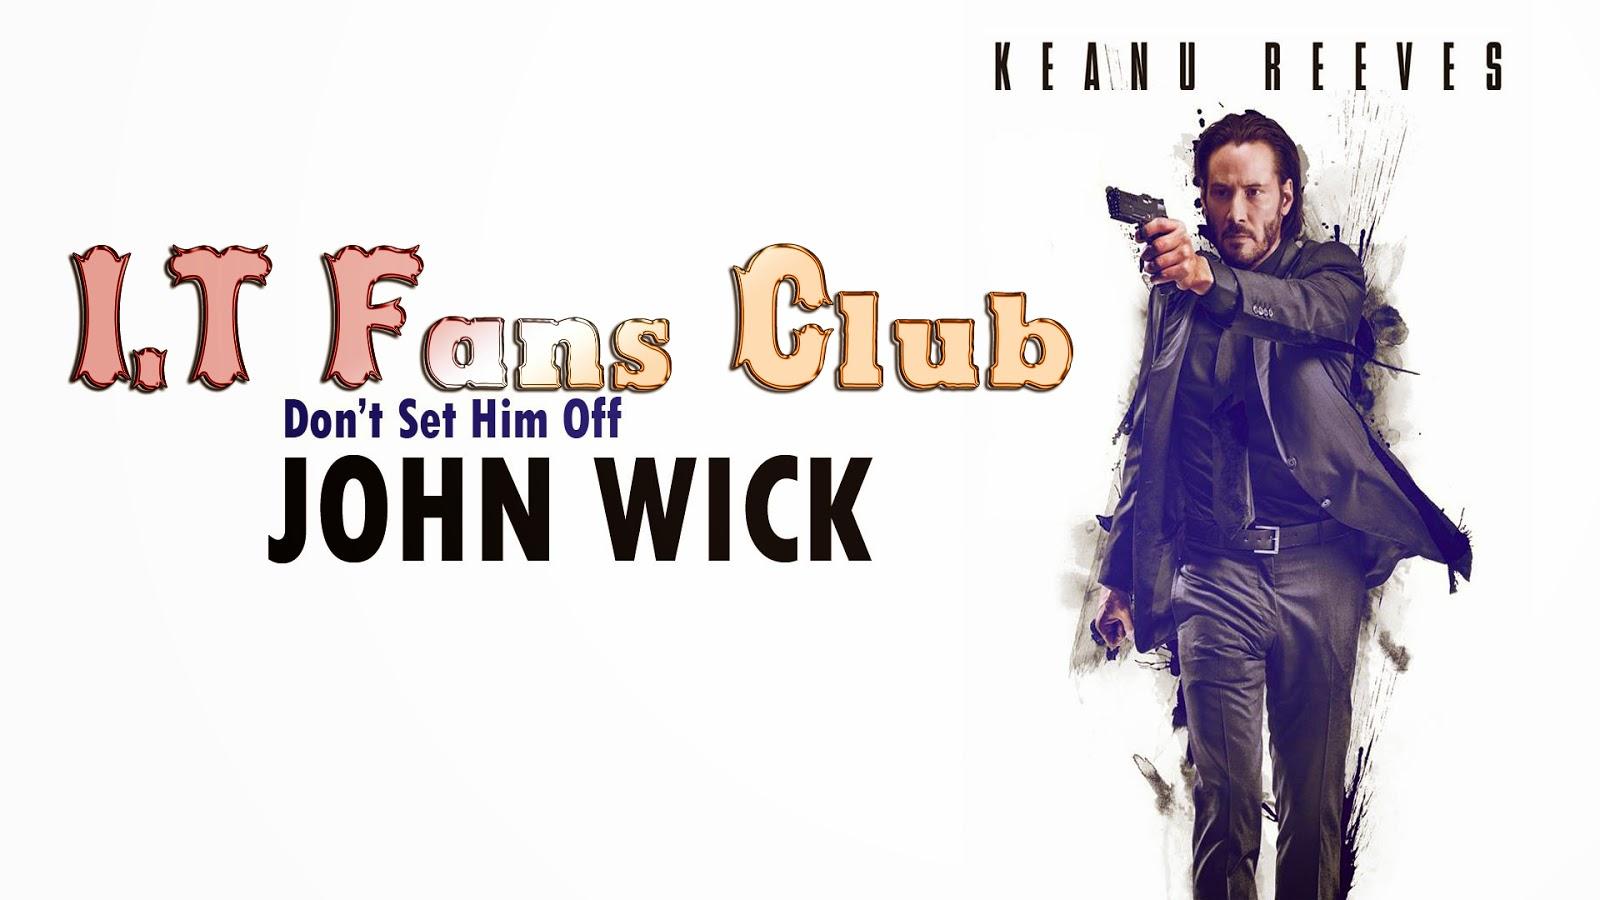 john wick 2014 full movie download 300mb